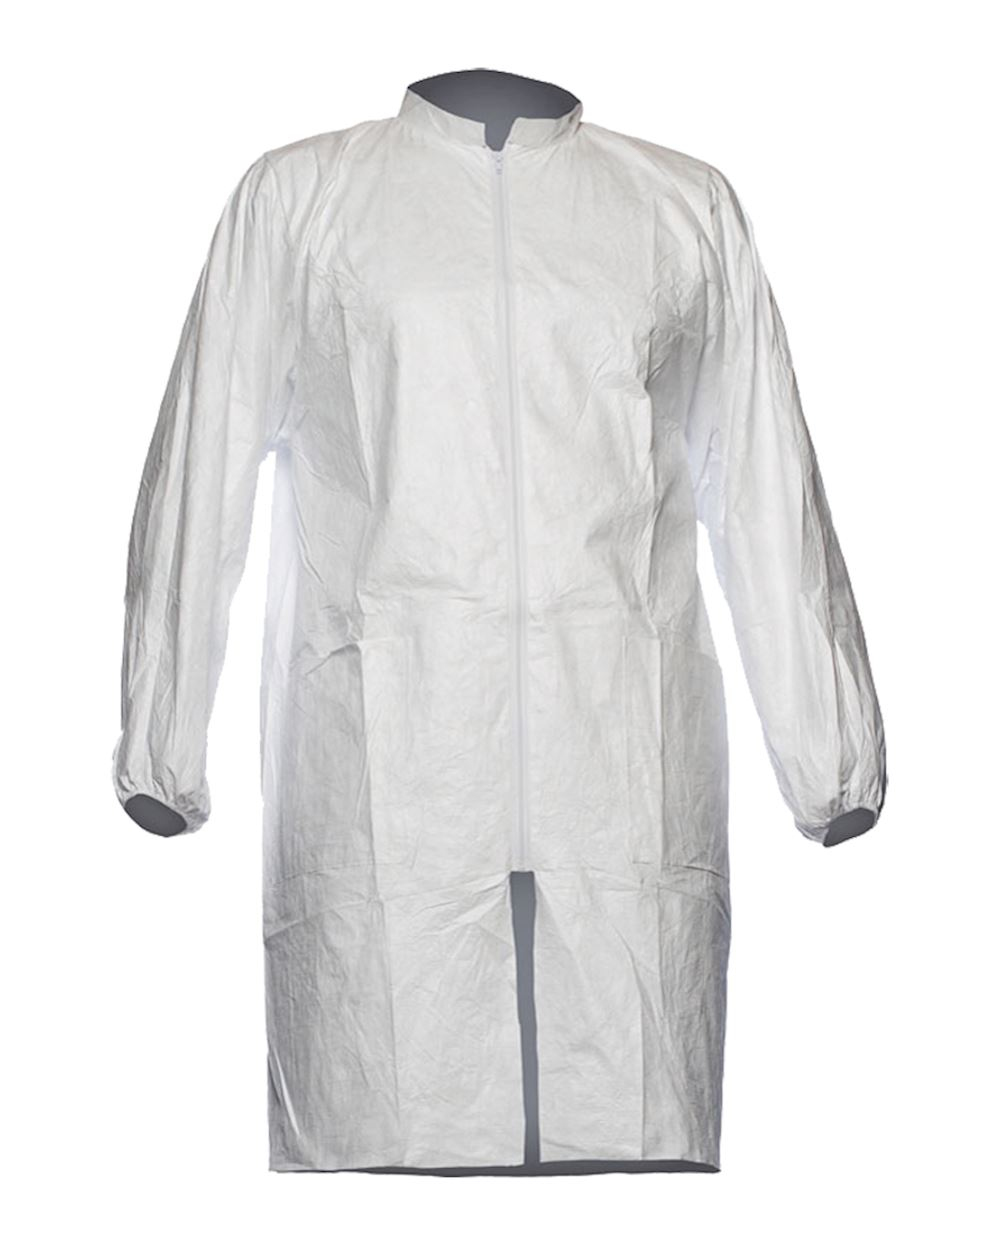 Tyvek 500 Lab coat PL309 - Small | From Aspli Safety